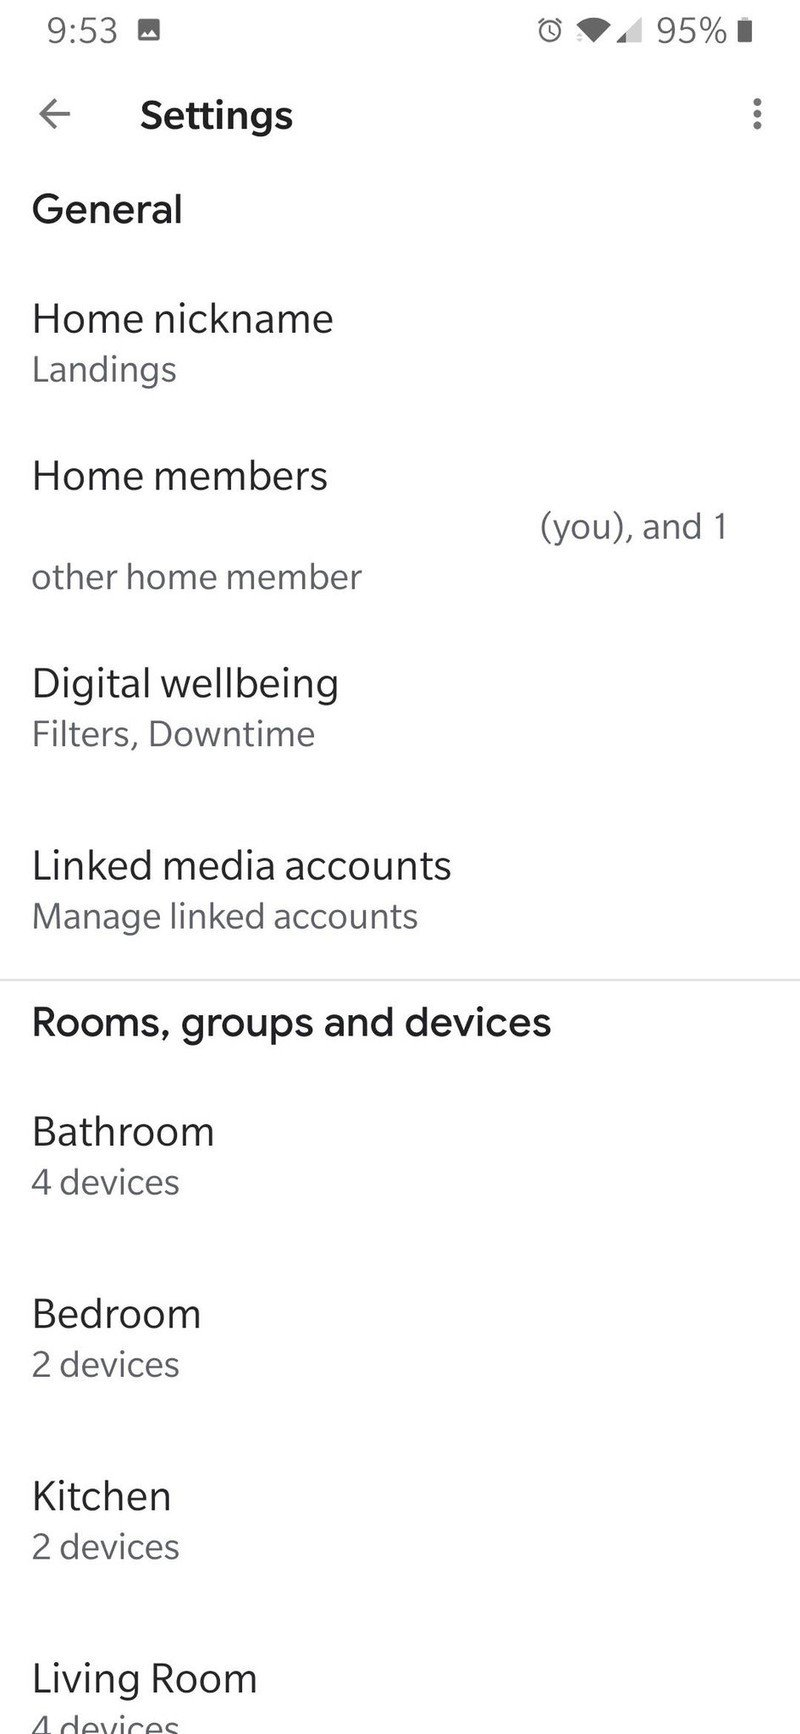 remove-google-home-member-2.jpg?itok=Ssk